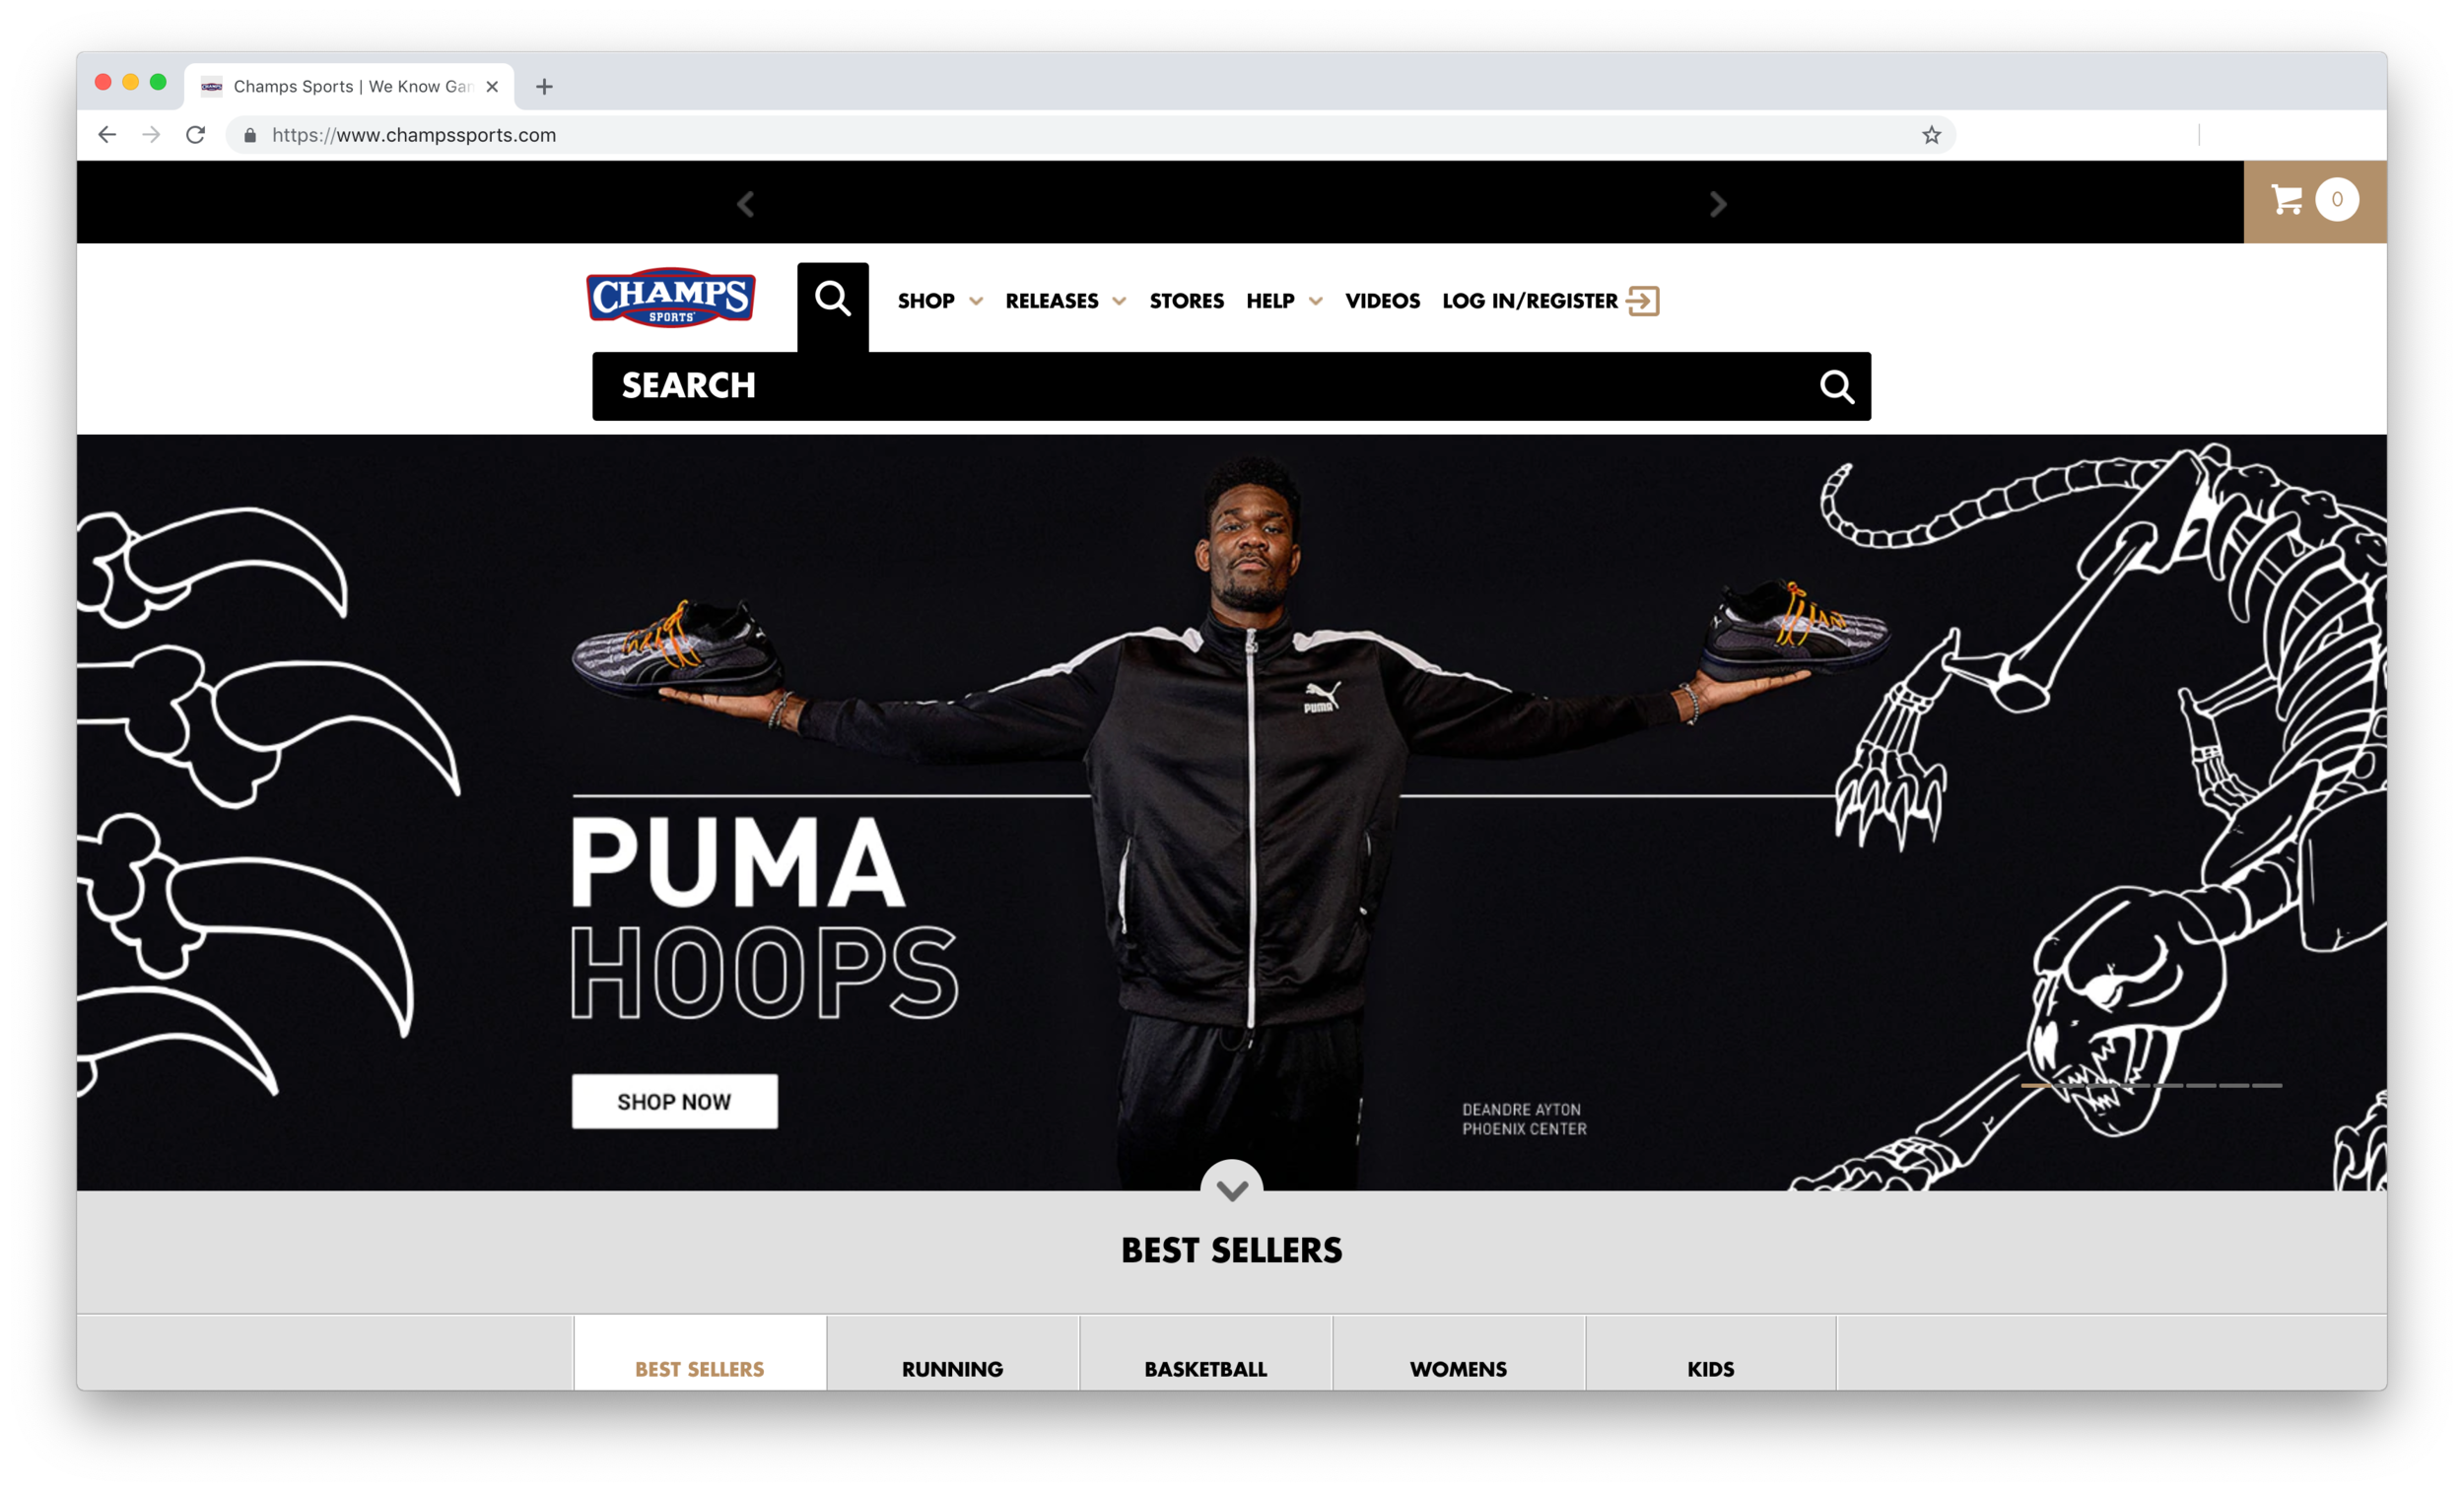 Champs Sports - Puma Hoops - DeAndre Ayton - Phoenix Commercial Photographer